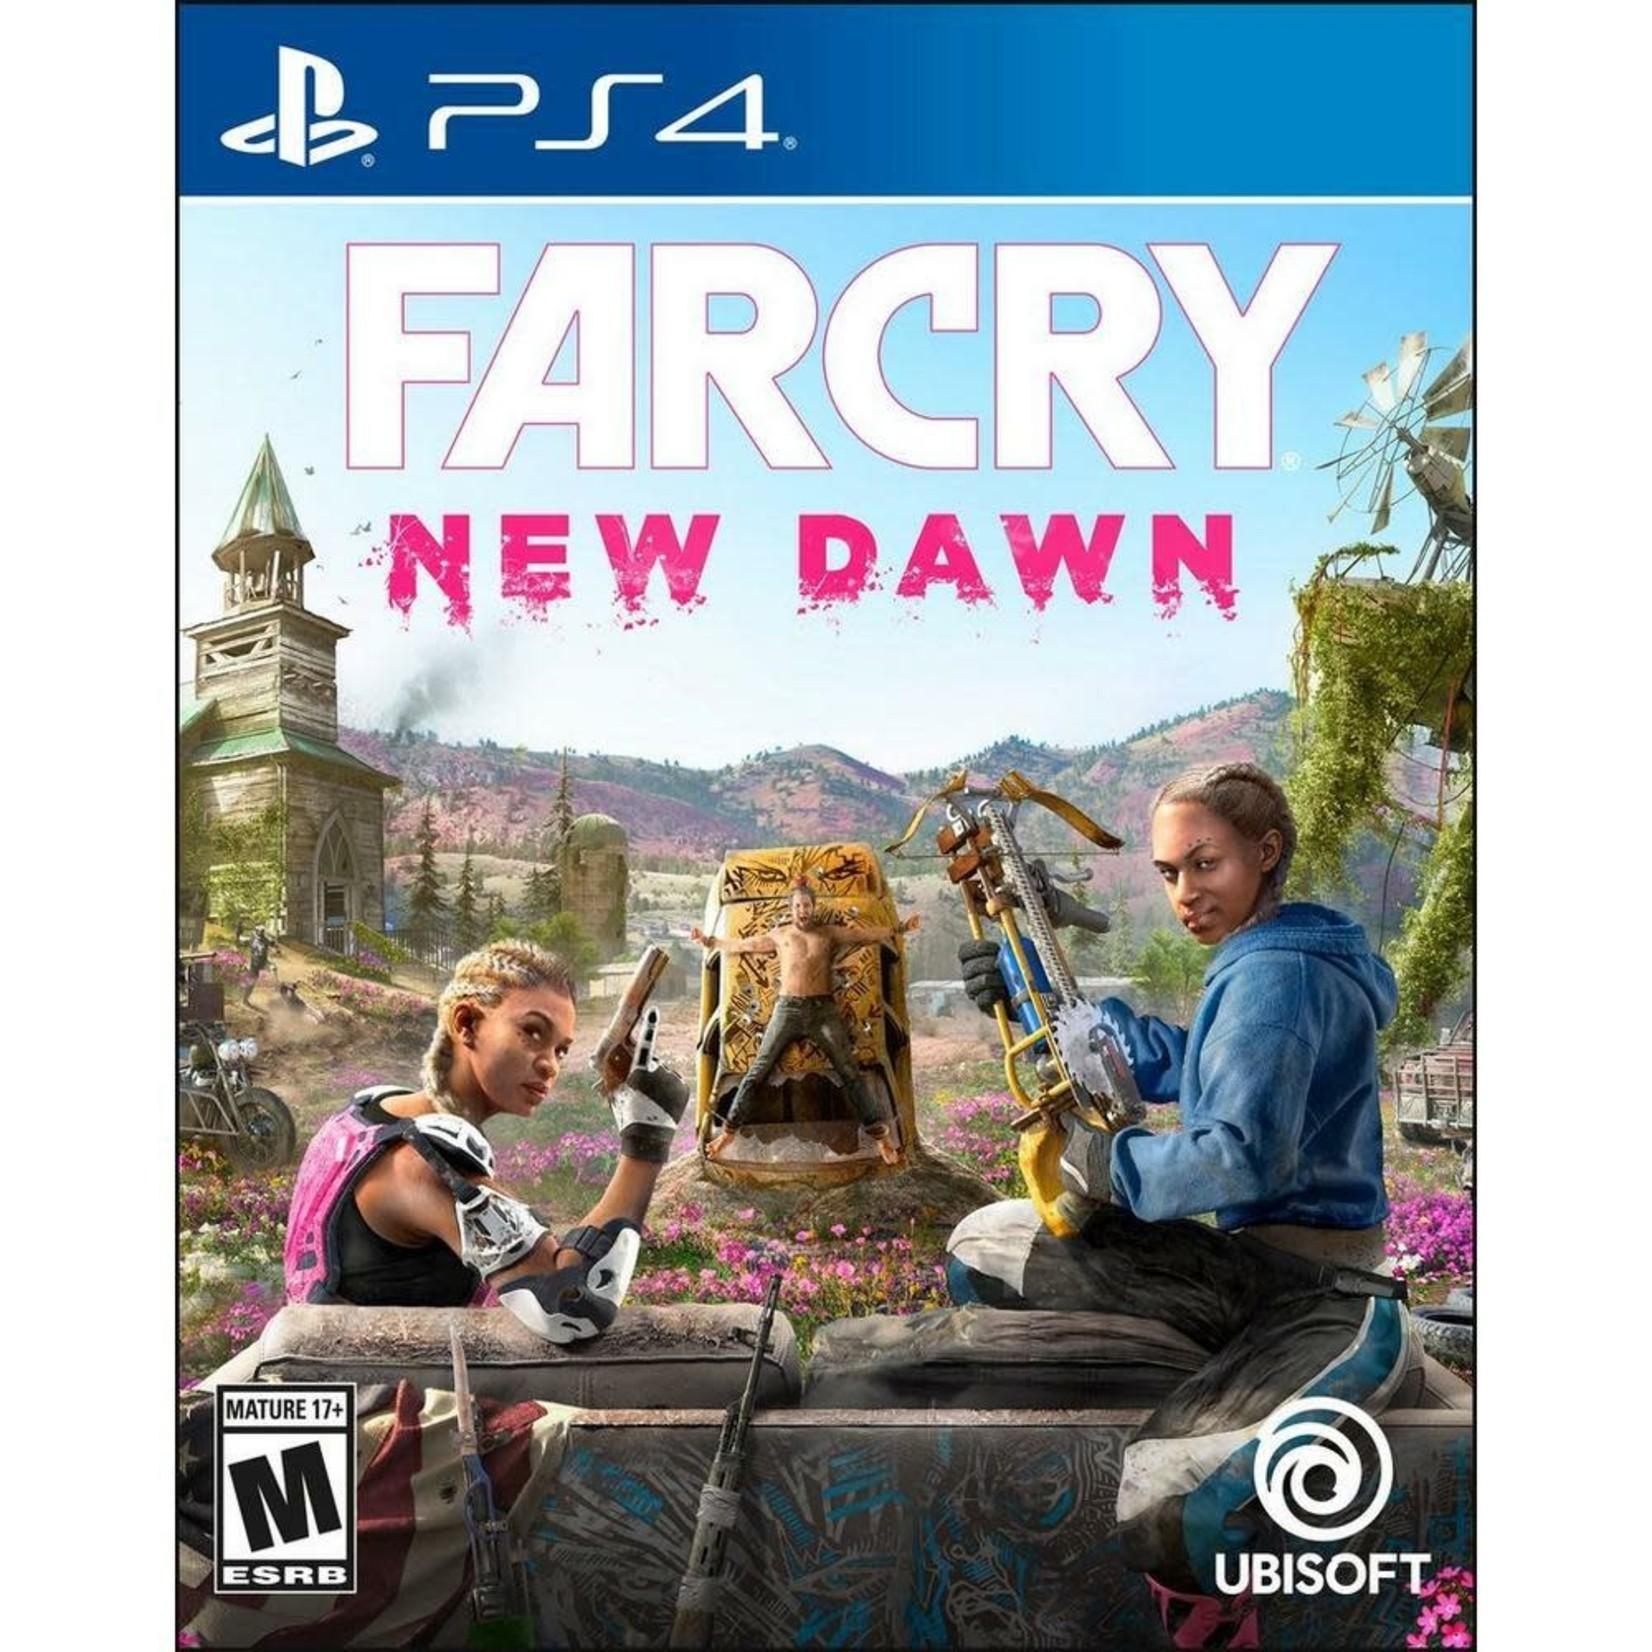 PS4-Far Cry New Dawn